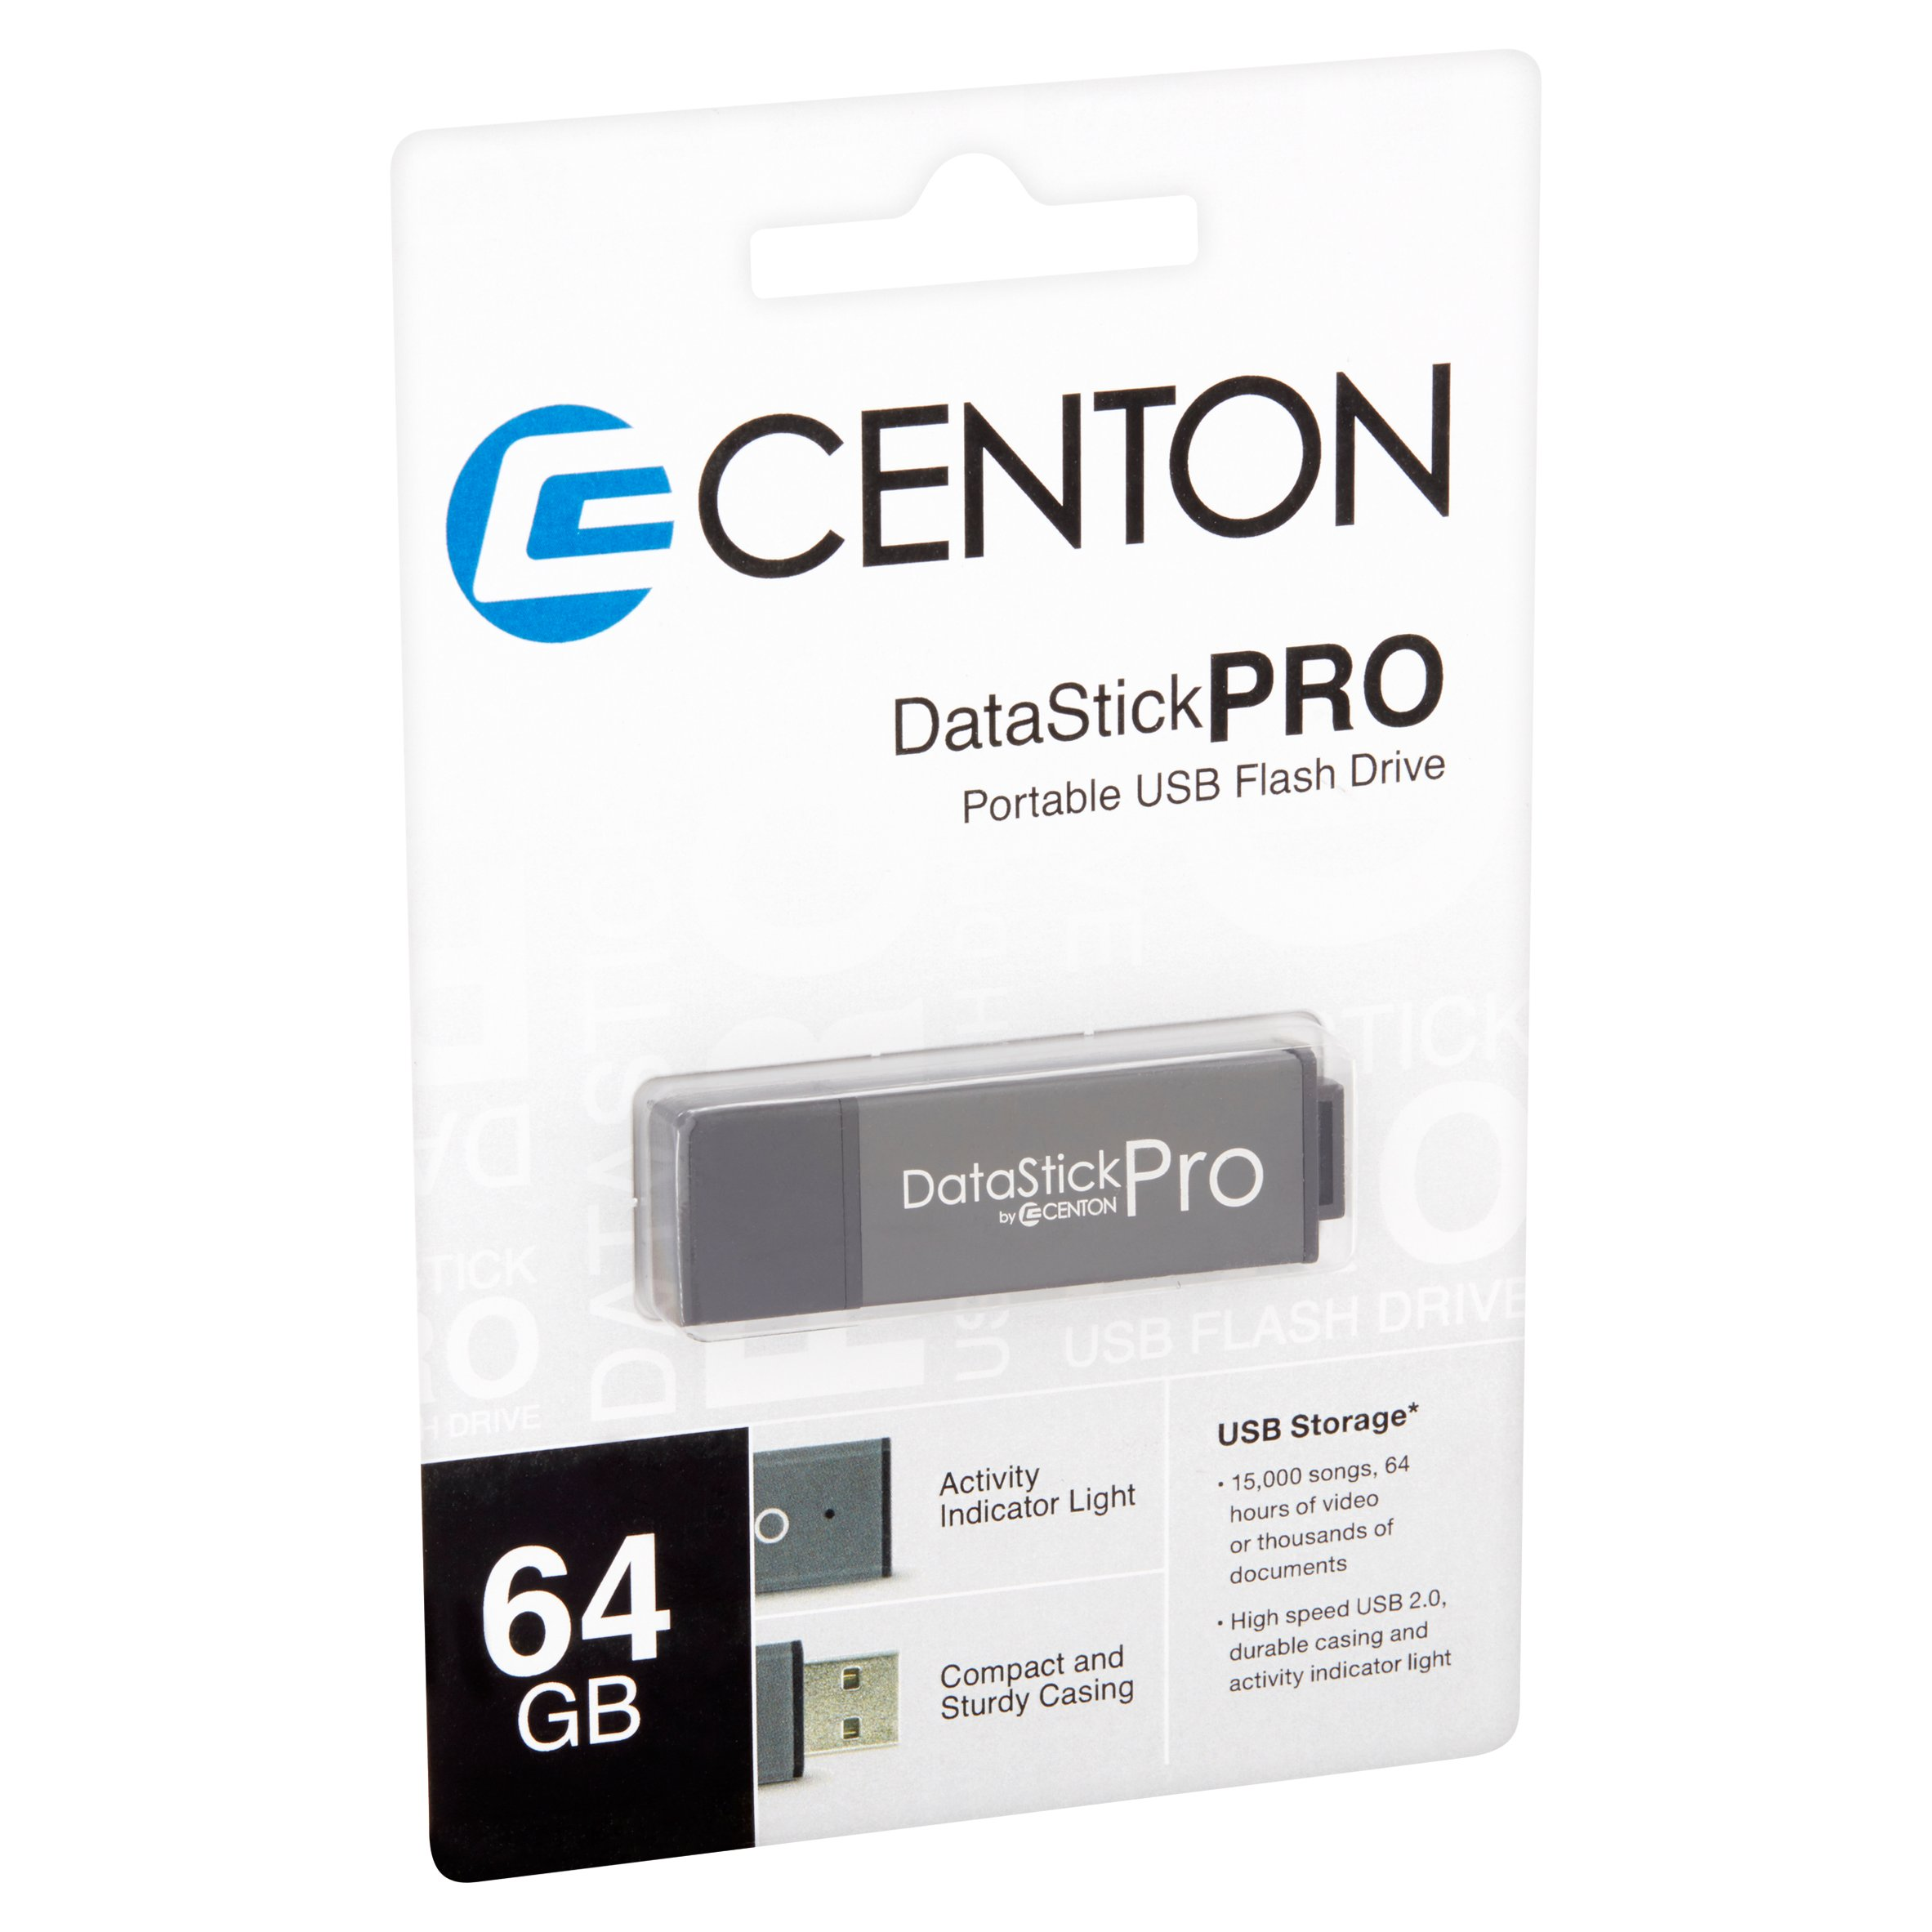 CENTON DATASTICK PRO 64GB WINDOWS 7 X64 DRIVER